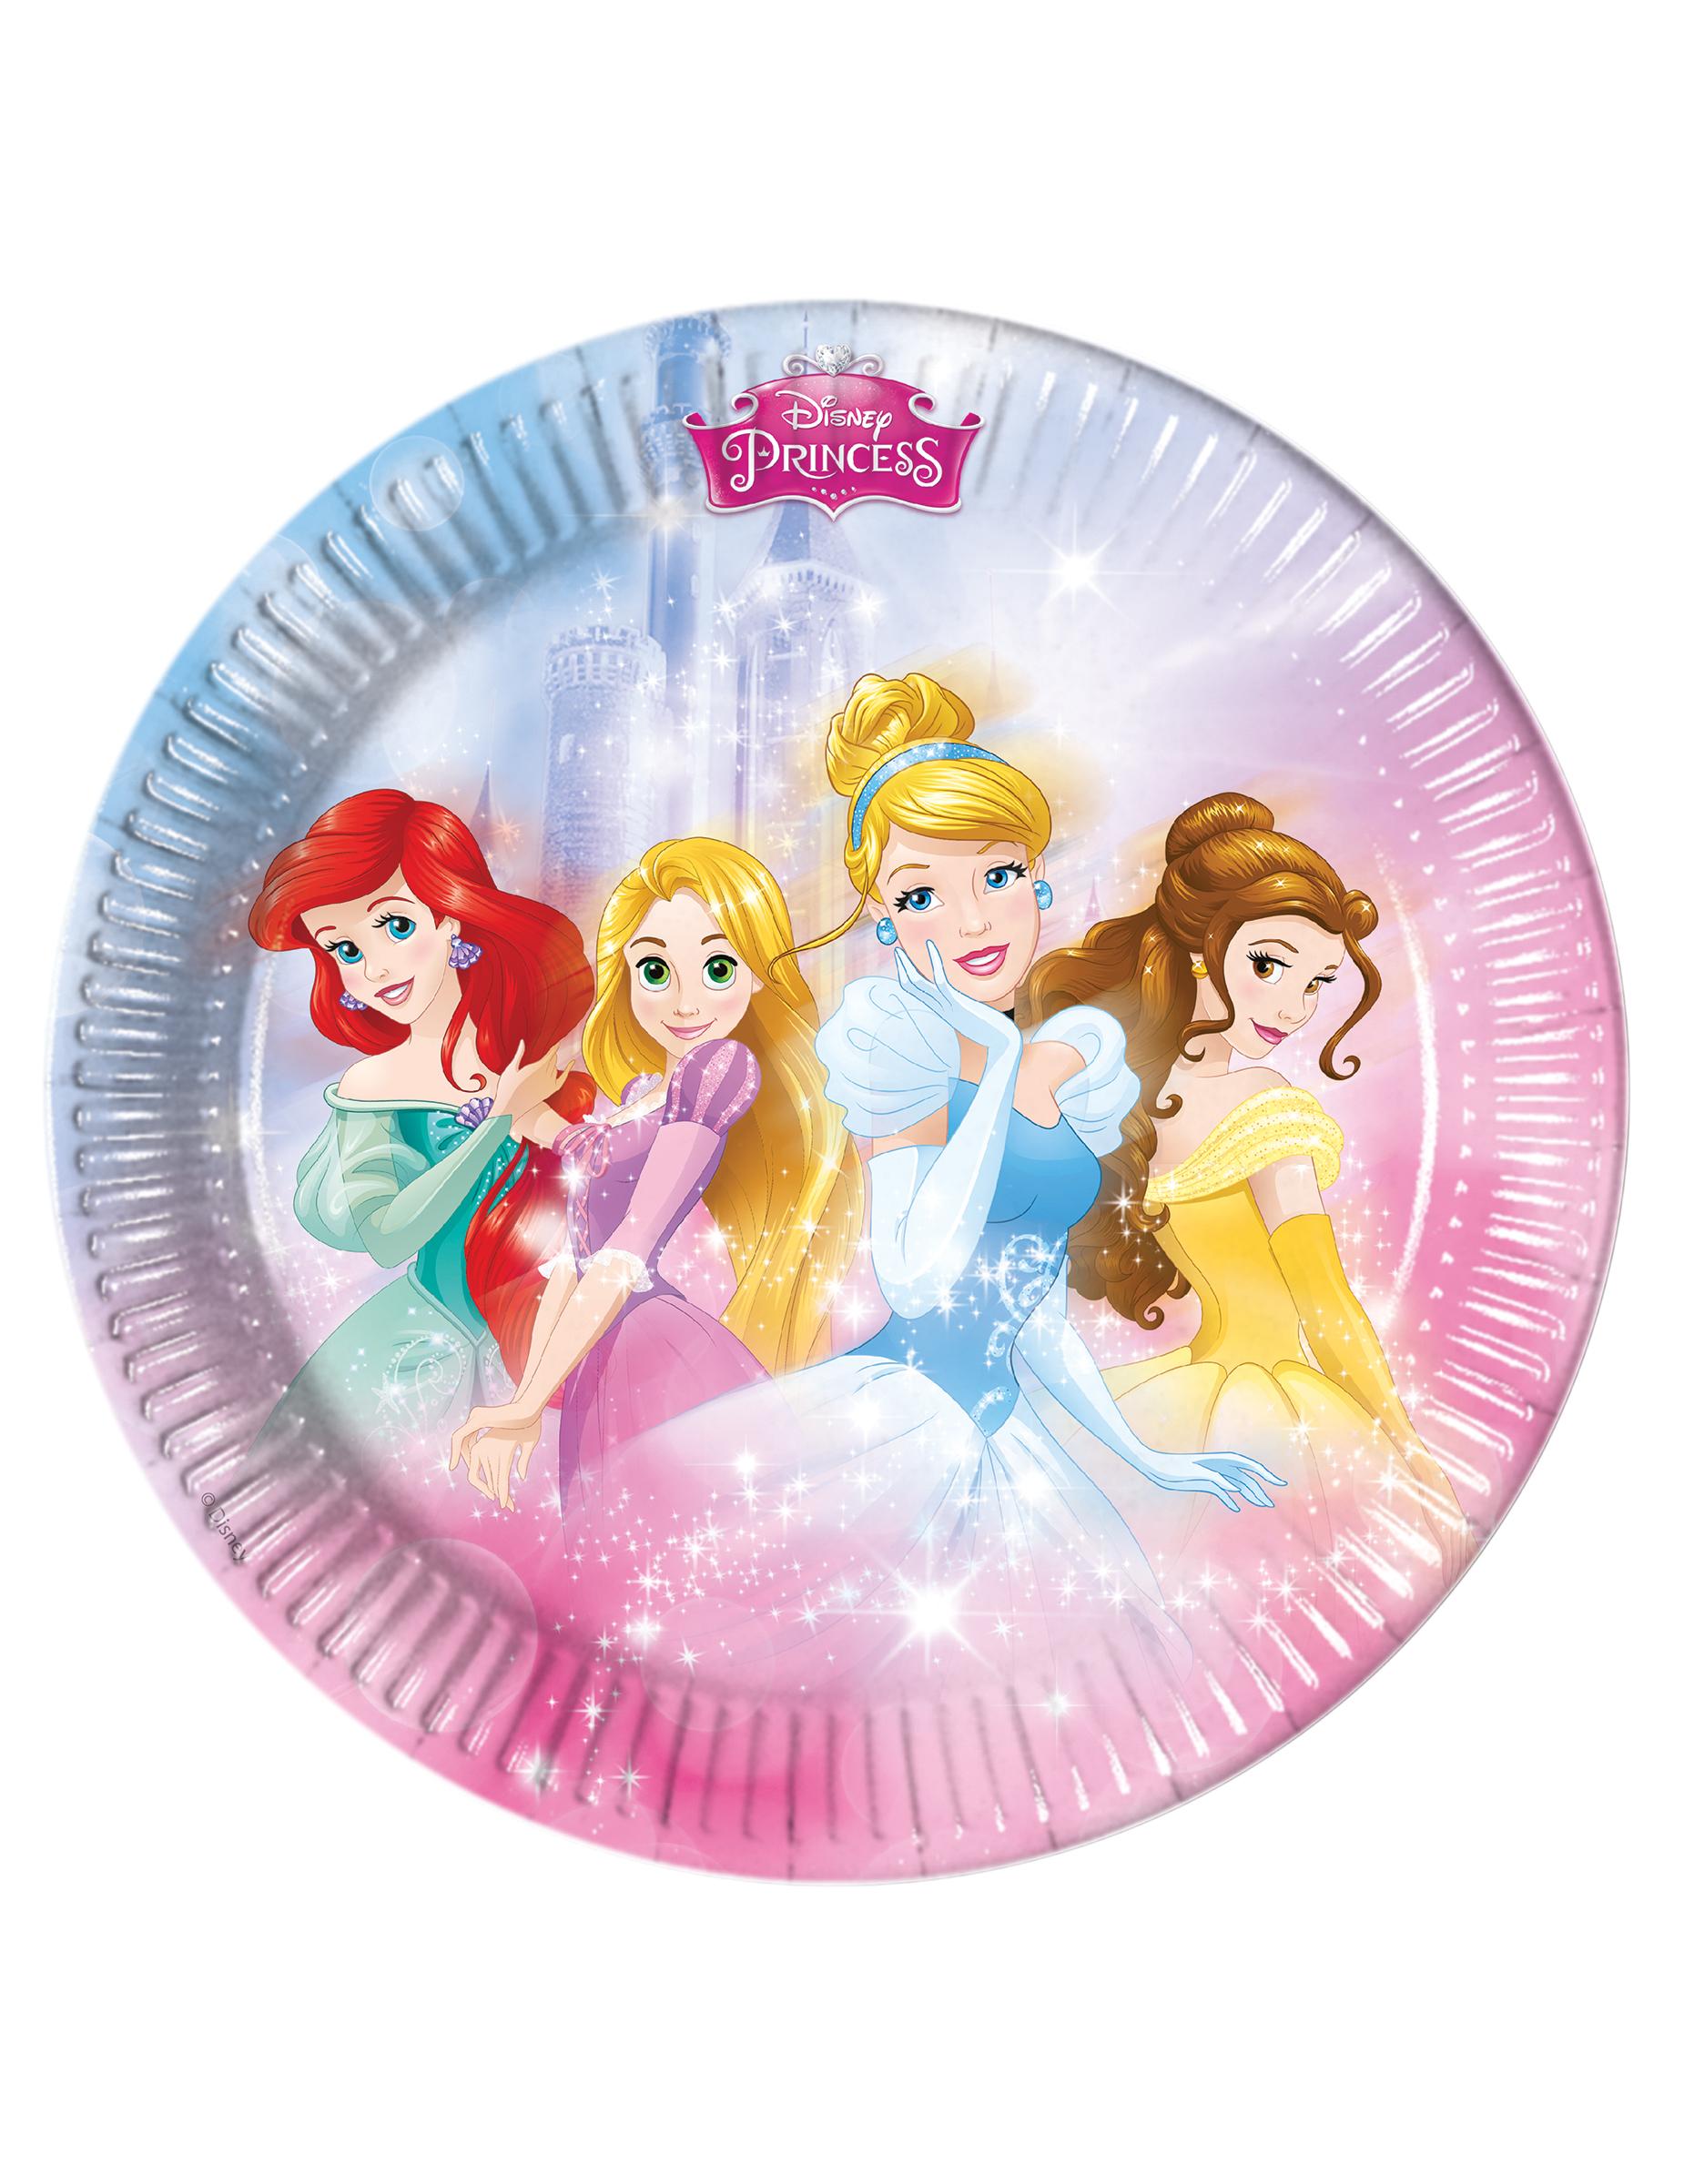 Set van 8 Disney prinsessen™ bordjes karton - Vegaoo.nl